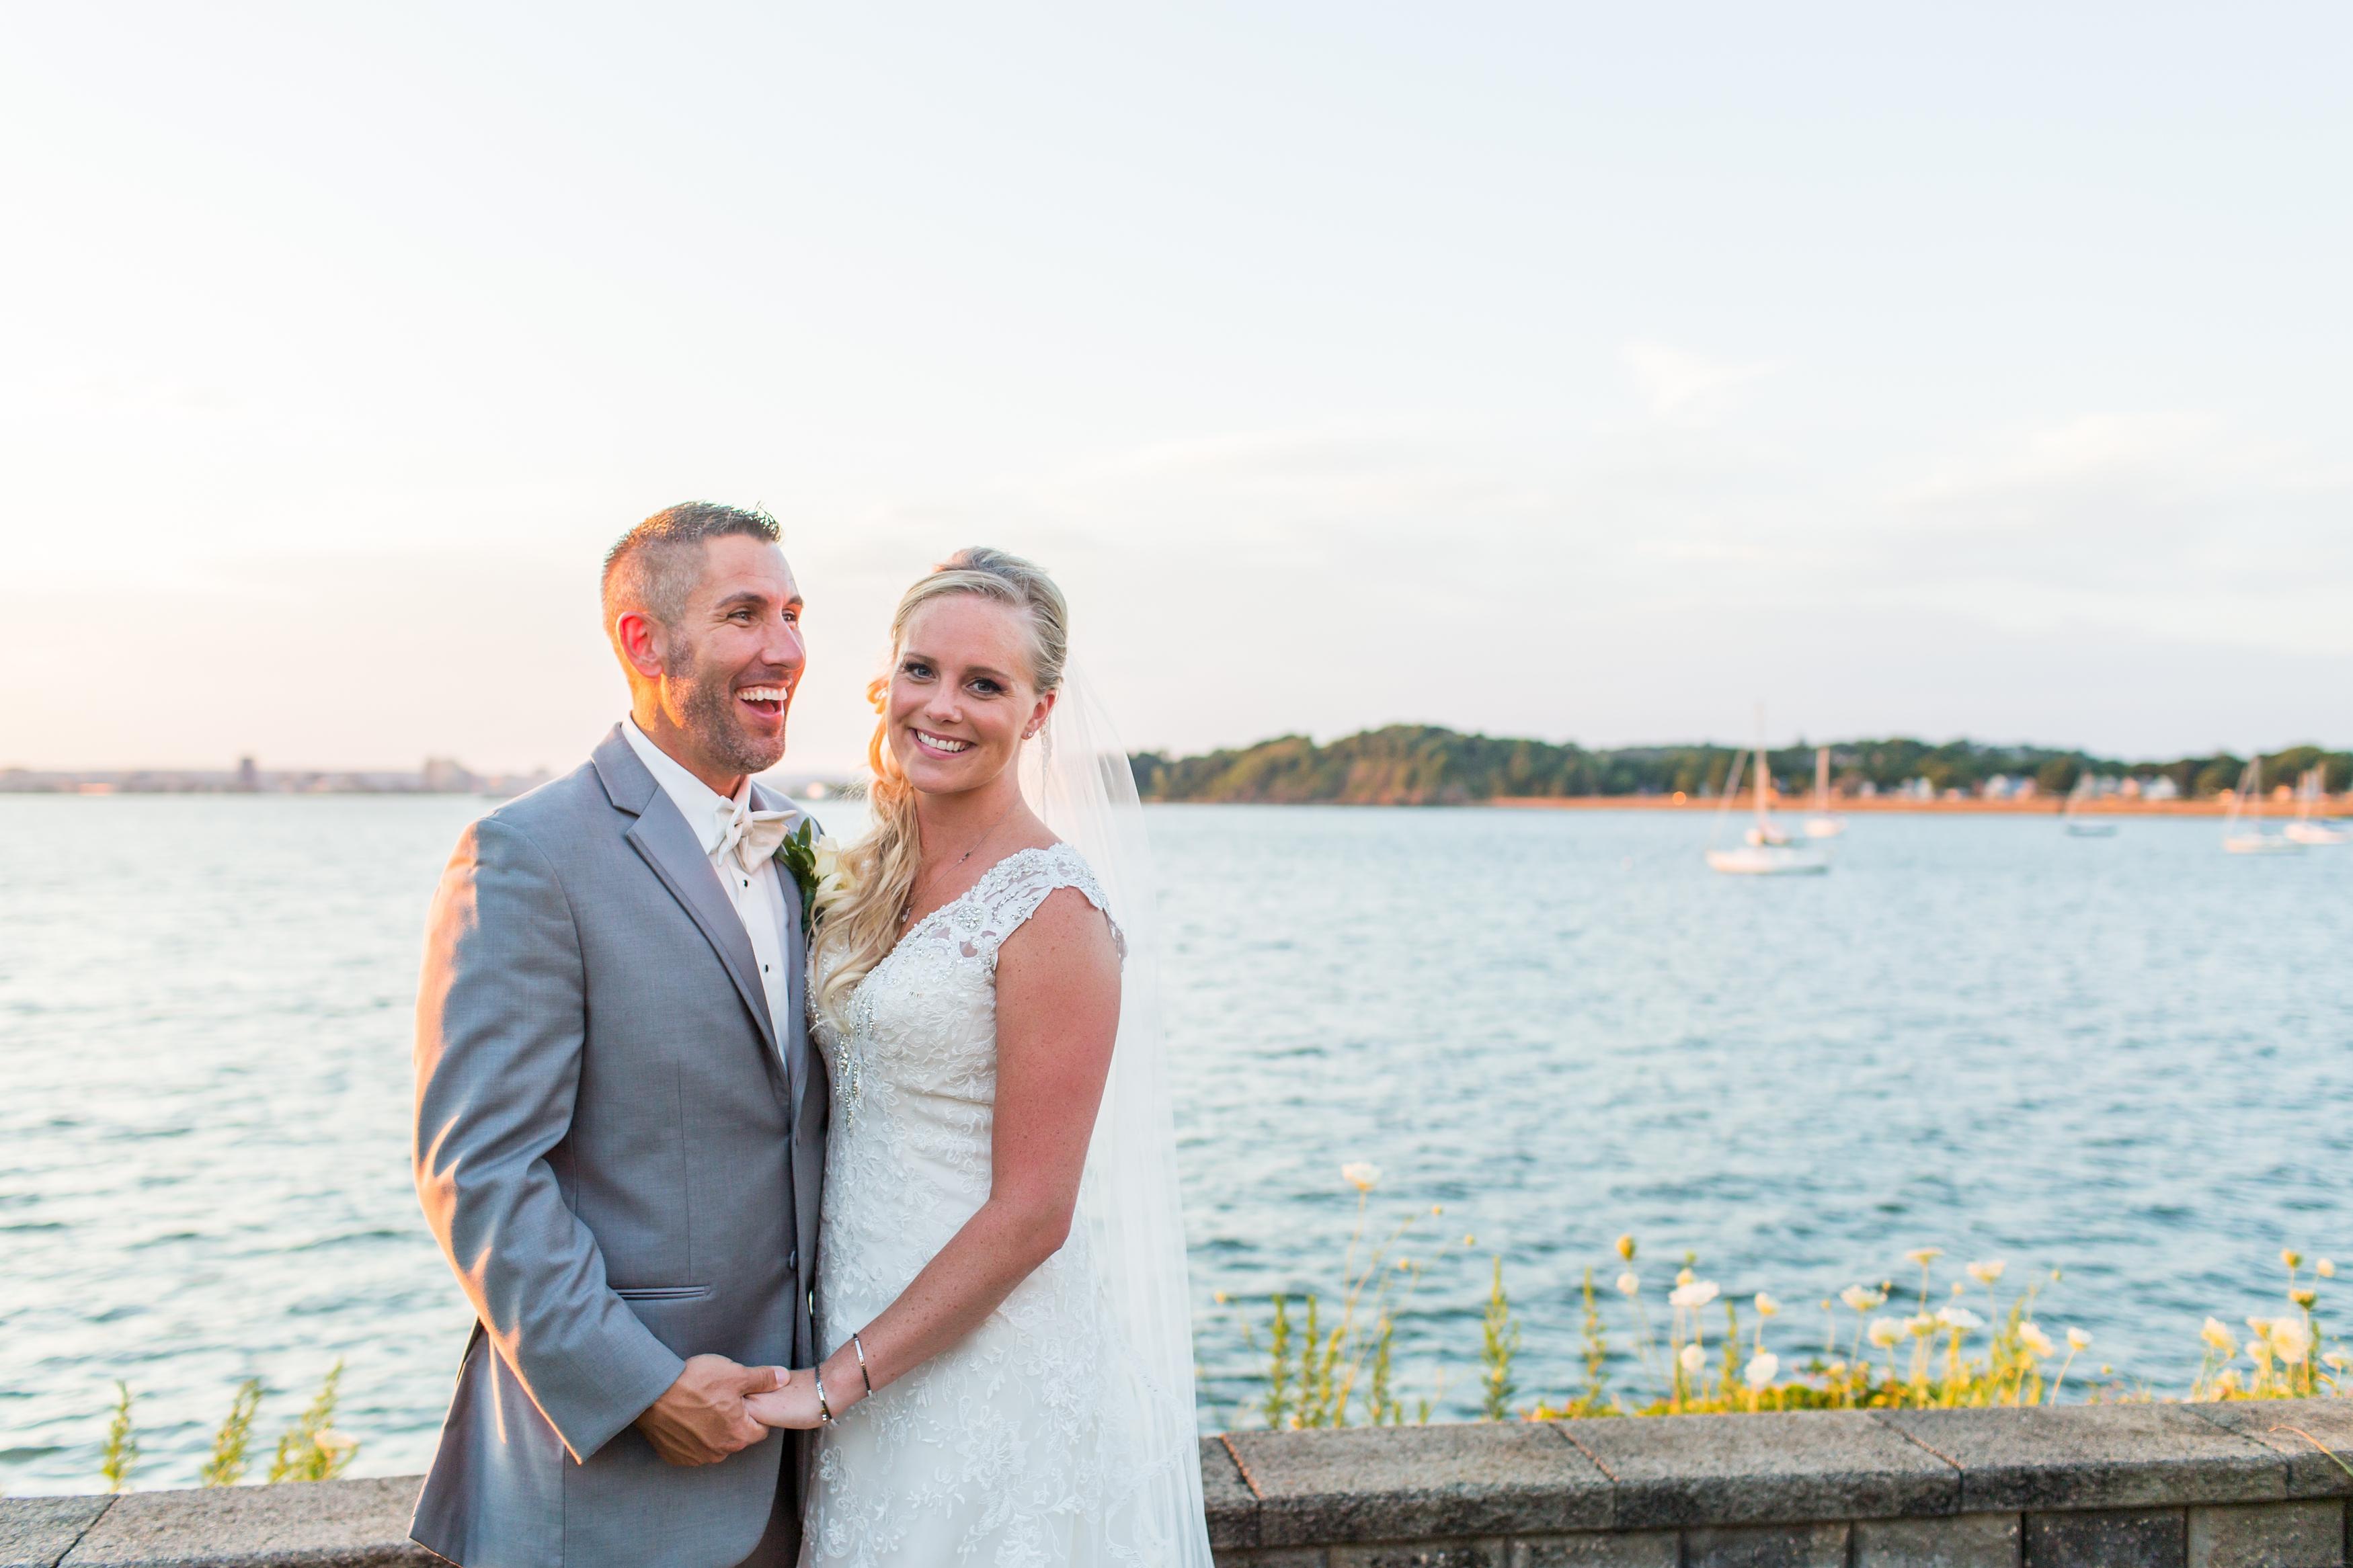 359allegra_anderson_ct_wedding_photographer_amarantes_2016